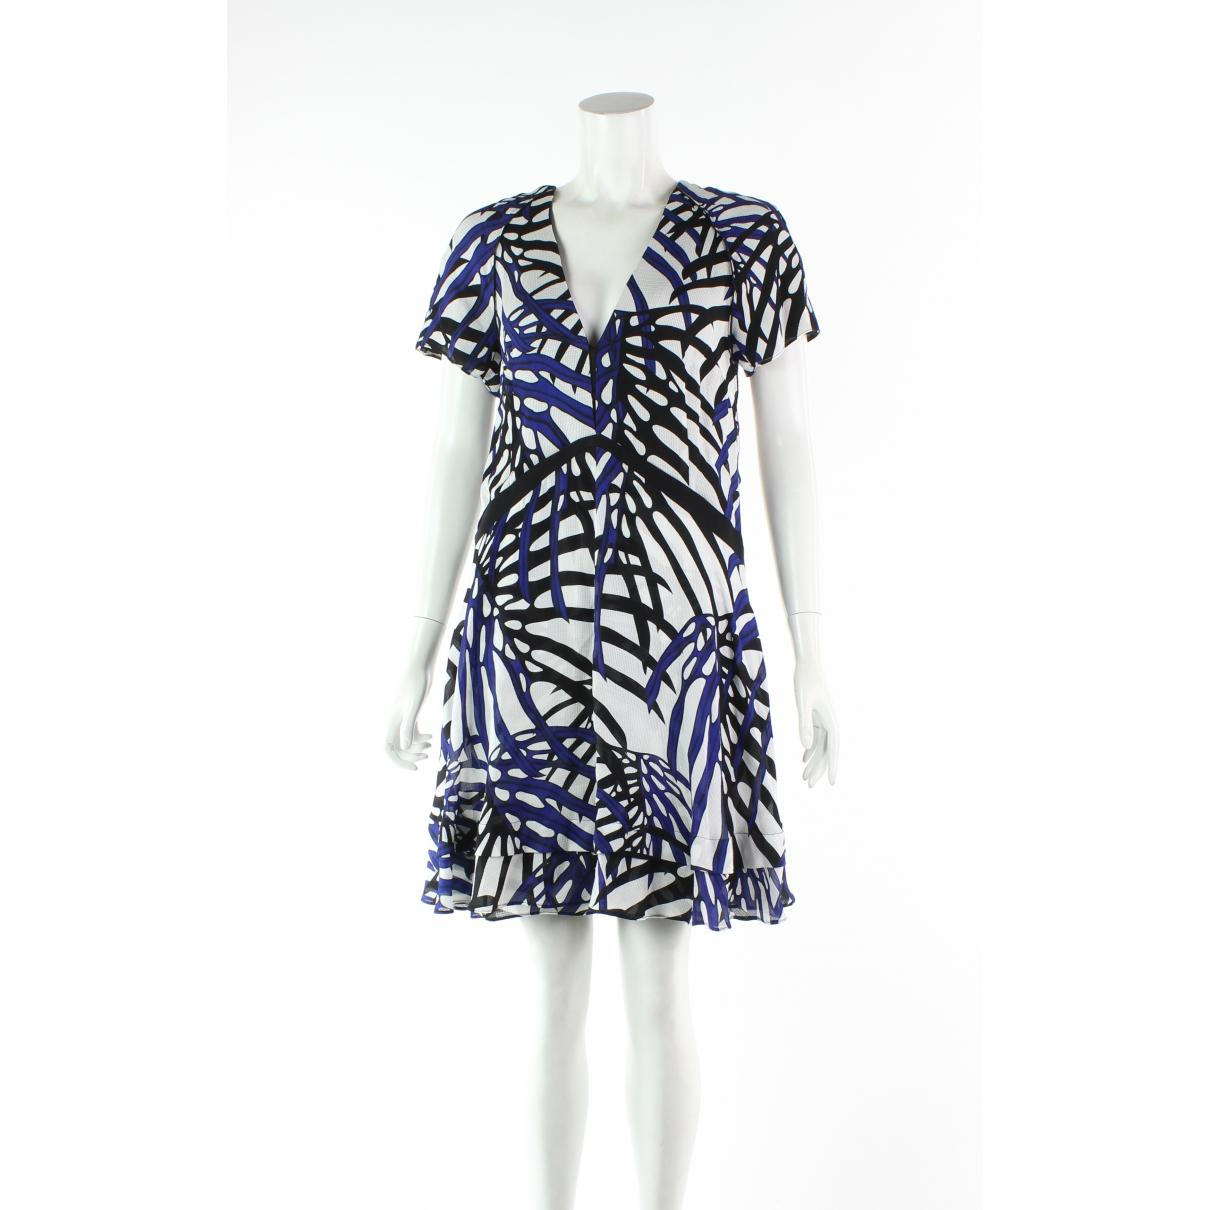 Proenza Schouler \N Multicolour Silk dress for Women 4 US